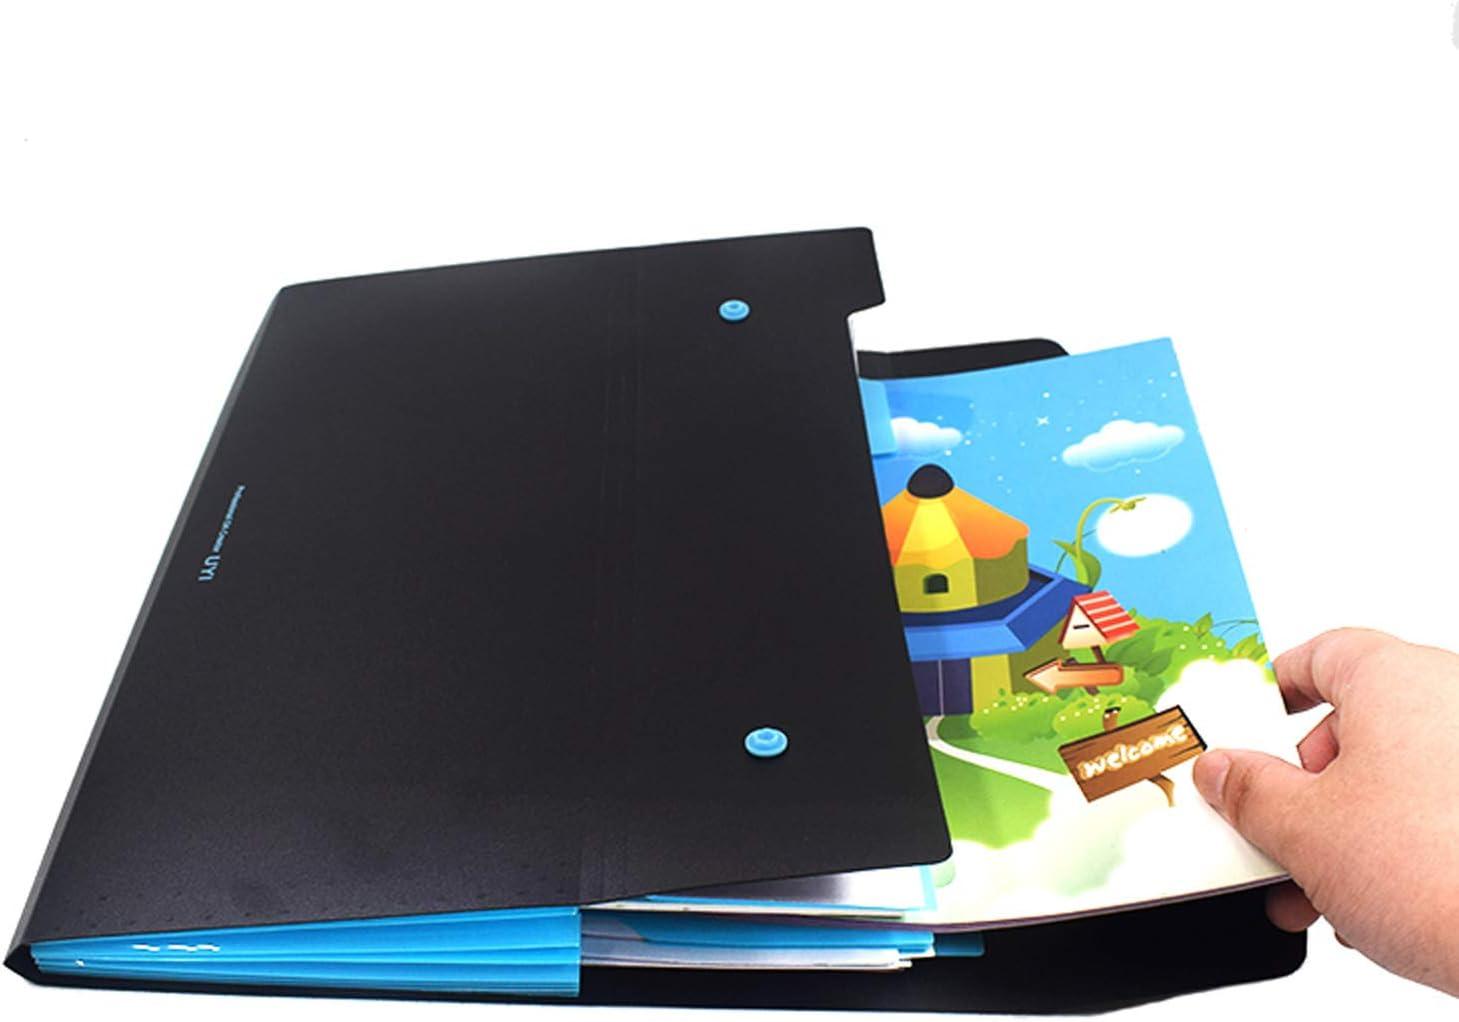 A4 Document Bag Double Twist Expanding File Plastic Bag Folder Organizer Holder Carrying Case Test Paper Clip Storage Pouch for Students Office Home Business Gift Paperwork BlackOrange, 1PCS